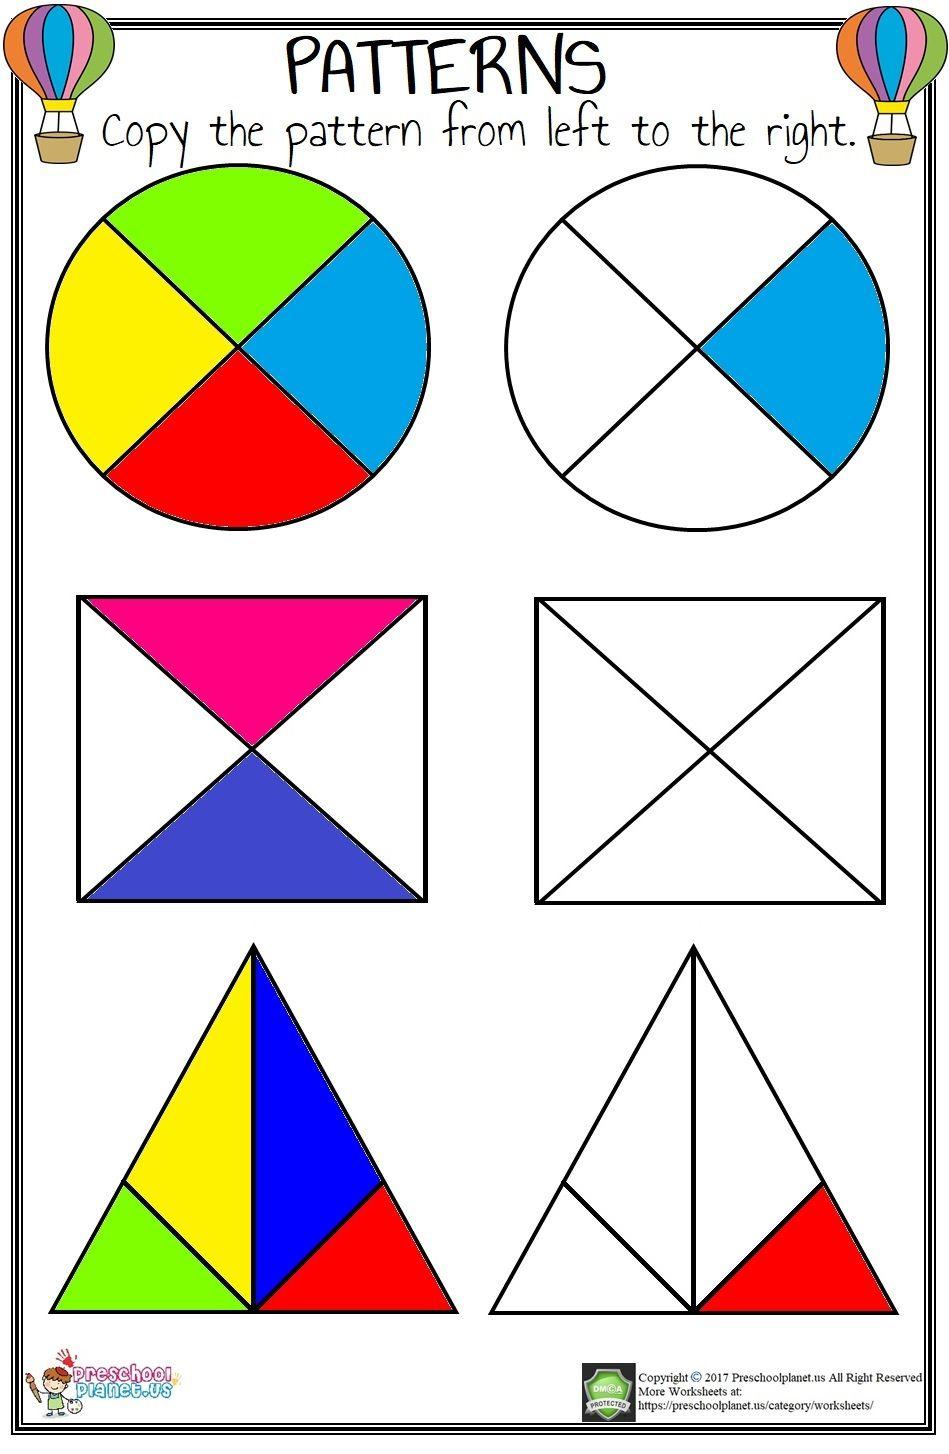 Pattern Worksheet For Kids Pattern Worksheet Pattern Activities Pattern Worksheets For Kindergarten [ 1454 x 949 Pixel ]